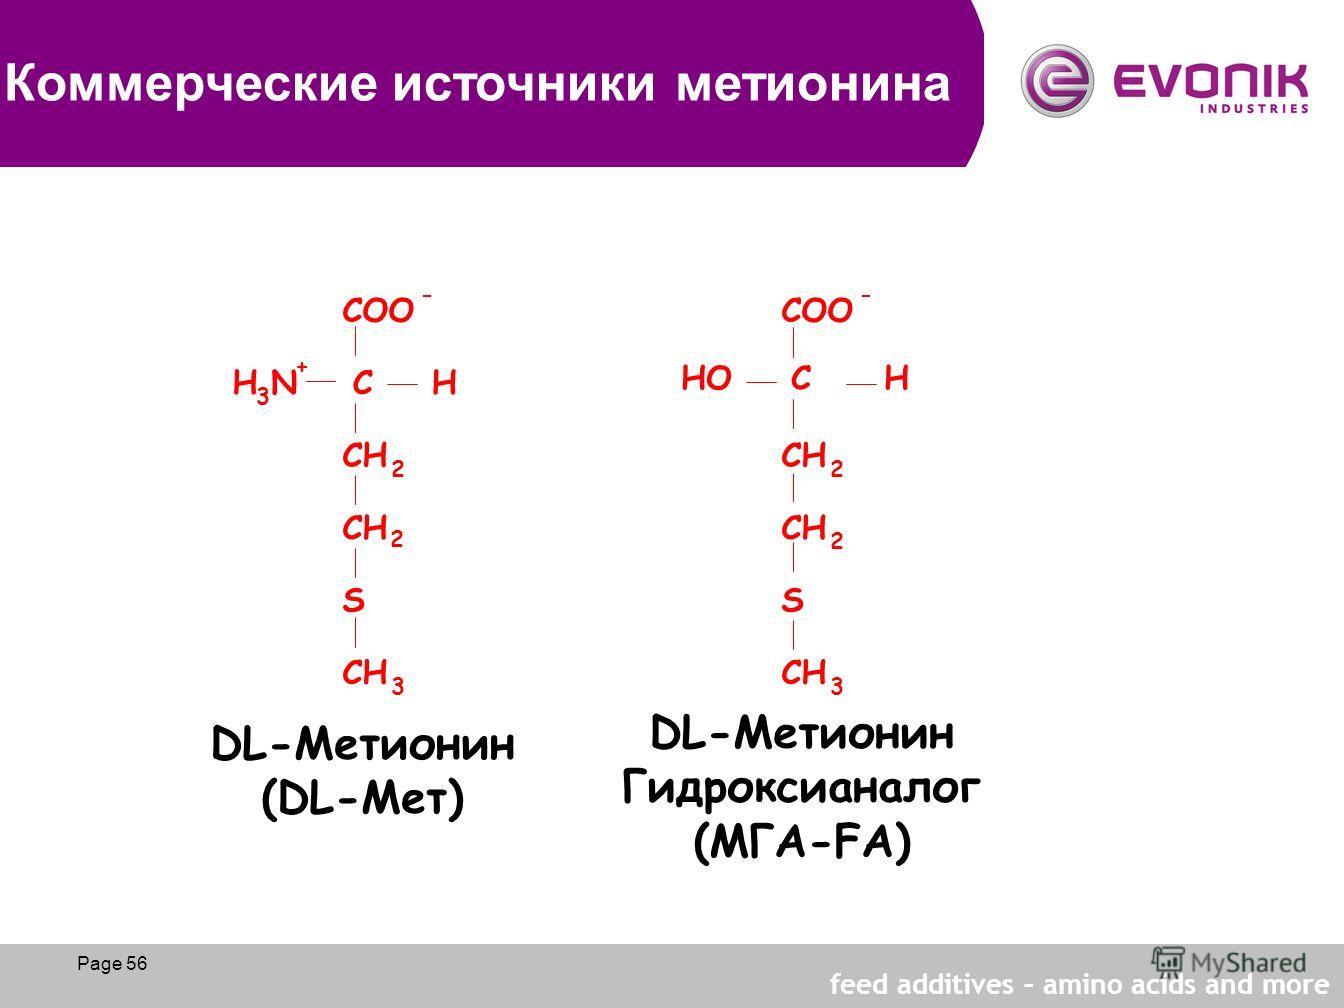 Page 56 C H COO - - H 3 N + CH 2 2 2 2 SS 3 3 DL-Метионин (DL-Meт) DL-Метионин Гидроксианалог (МГА-FA) HO C H Коммерческие источники метионина Page 56 feed additives – amino acids and more